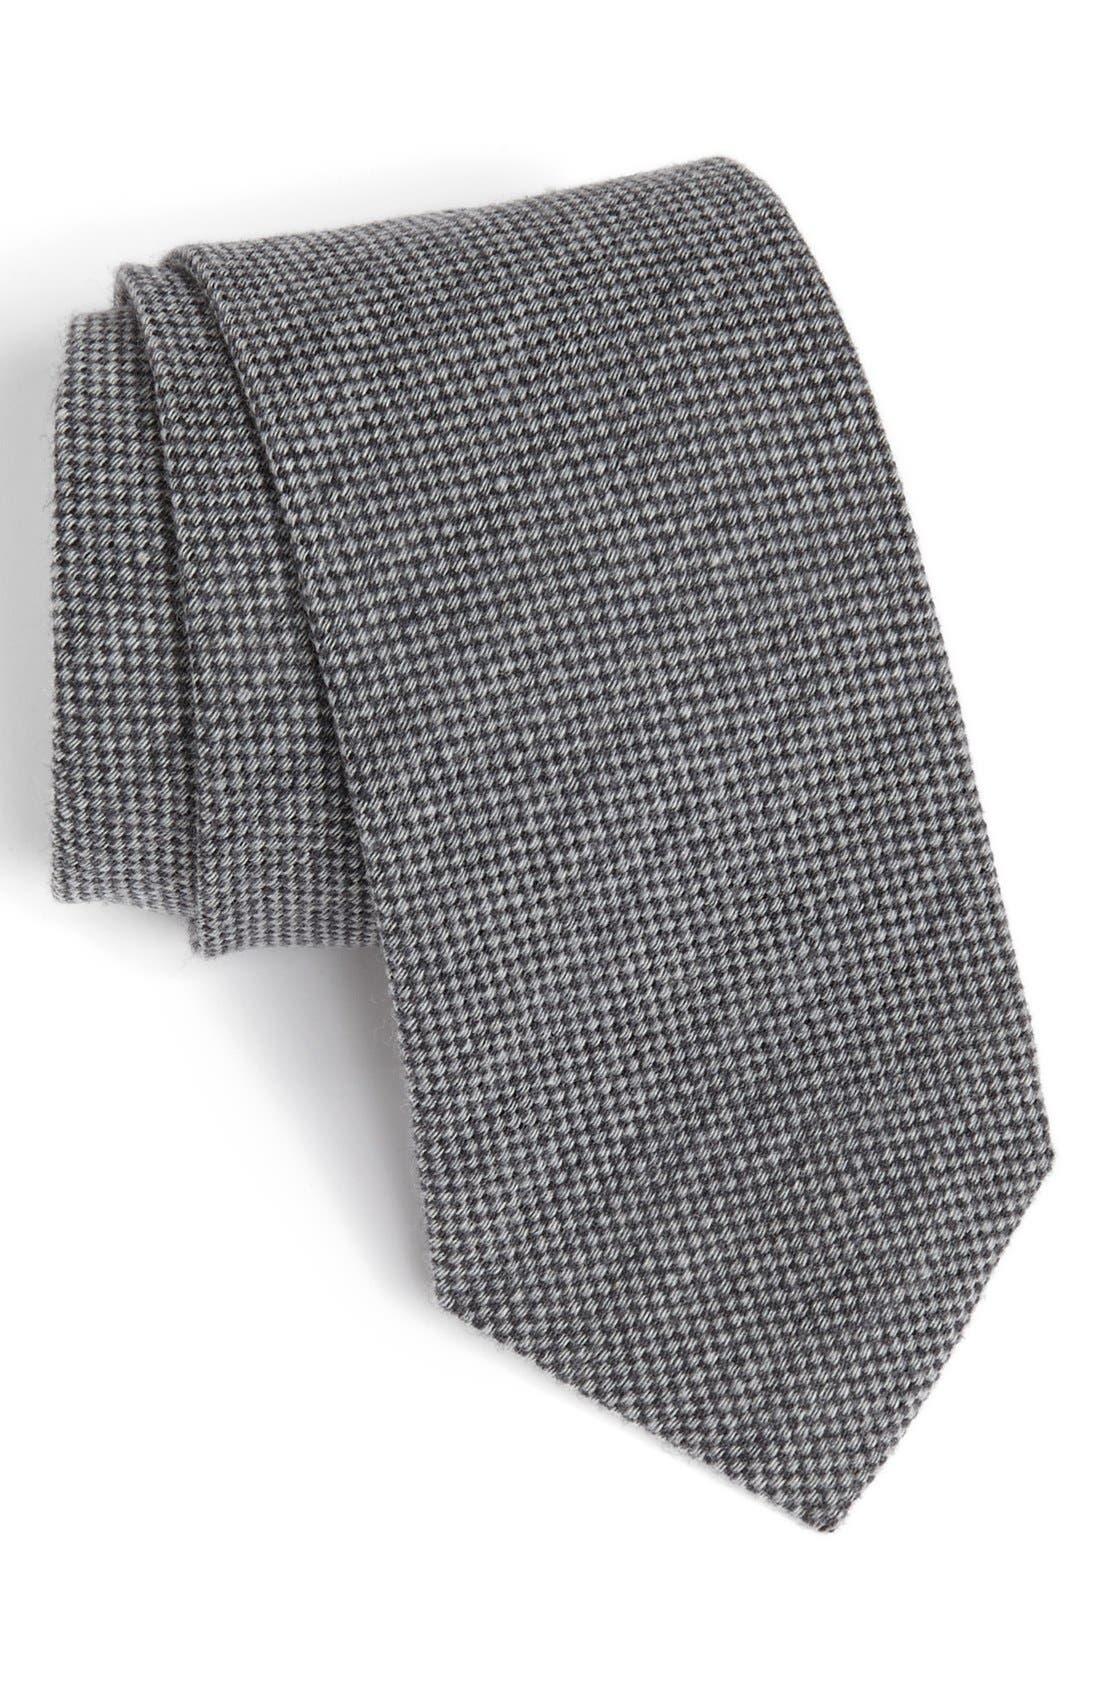 Main Image - John W. Nordstrom Woven Wool Tie